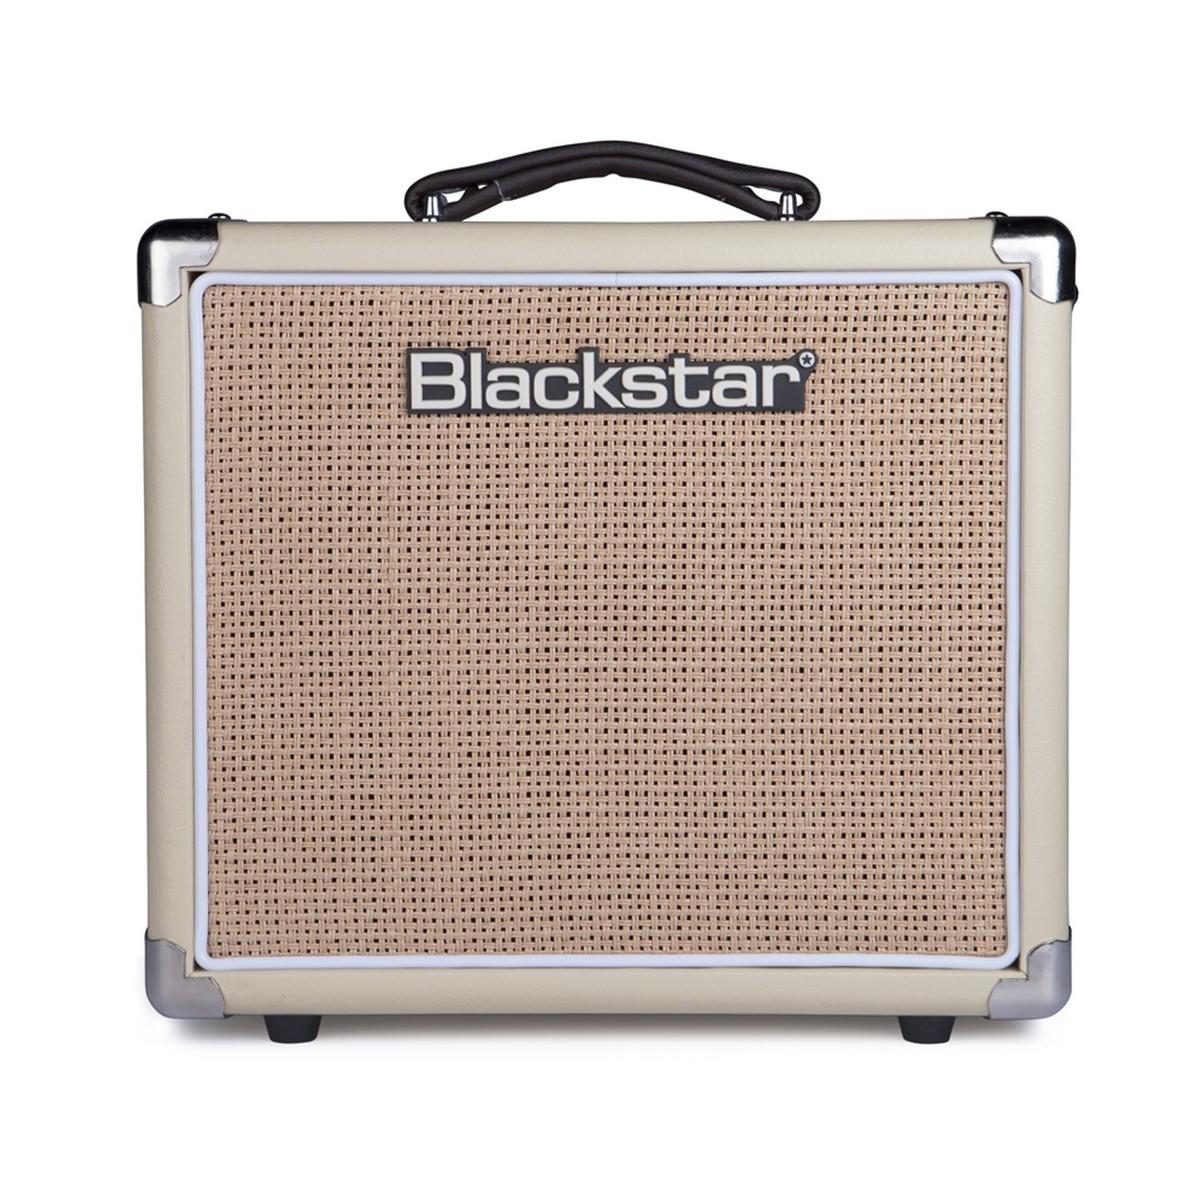 disc blackstar ht 1r 1x8 combo blonde w reverb at gear4music. Black Bedroom Furniture Sets. Home Design Ideas